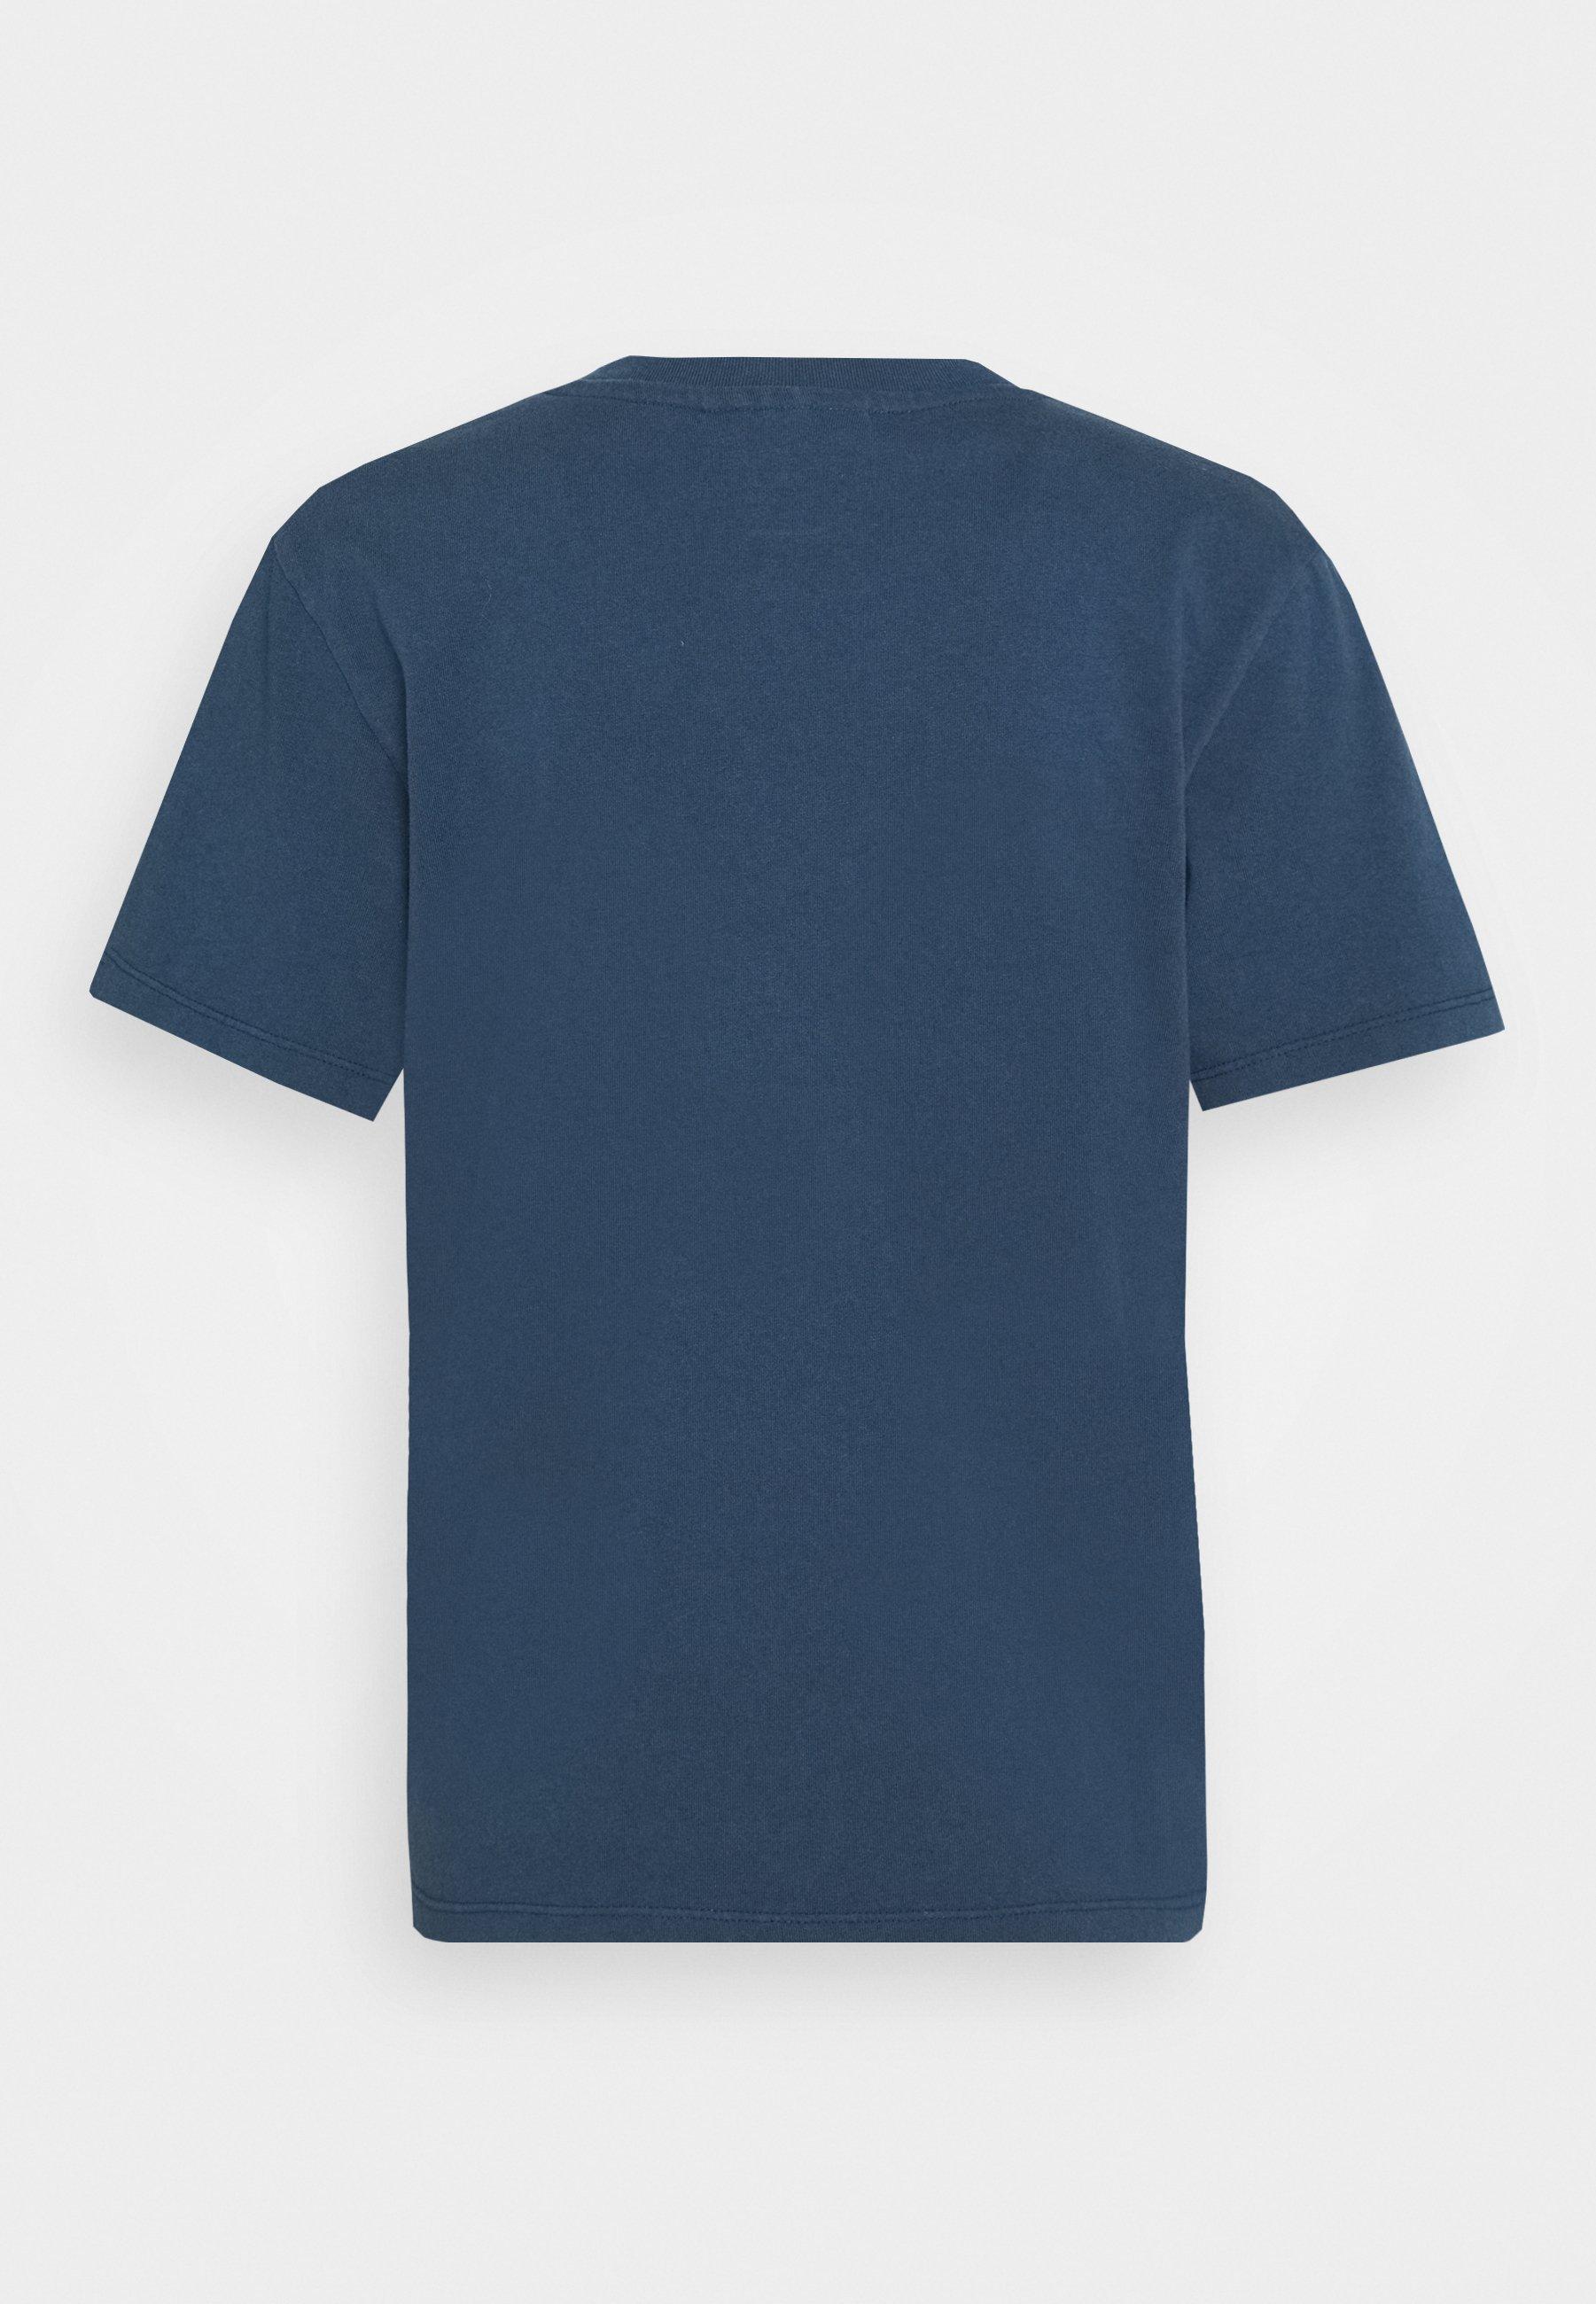 Han Kjøbenhavn Artwork Tee - T-shirts Med Print Faded Navy/mørkeblå